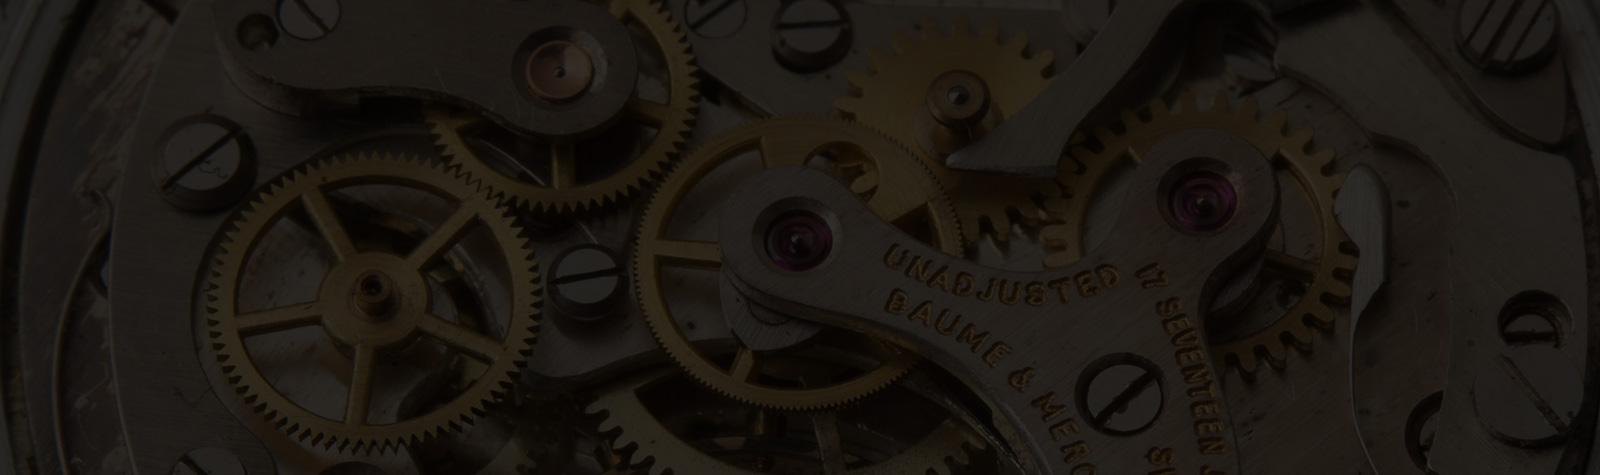 VINTAGE WATCH: 1940s Baume & Mercier Chronograph